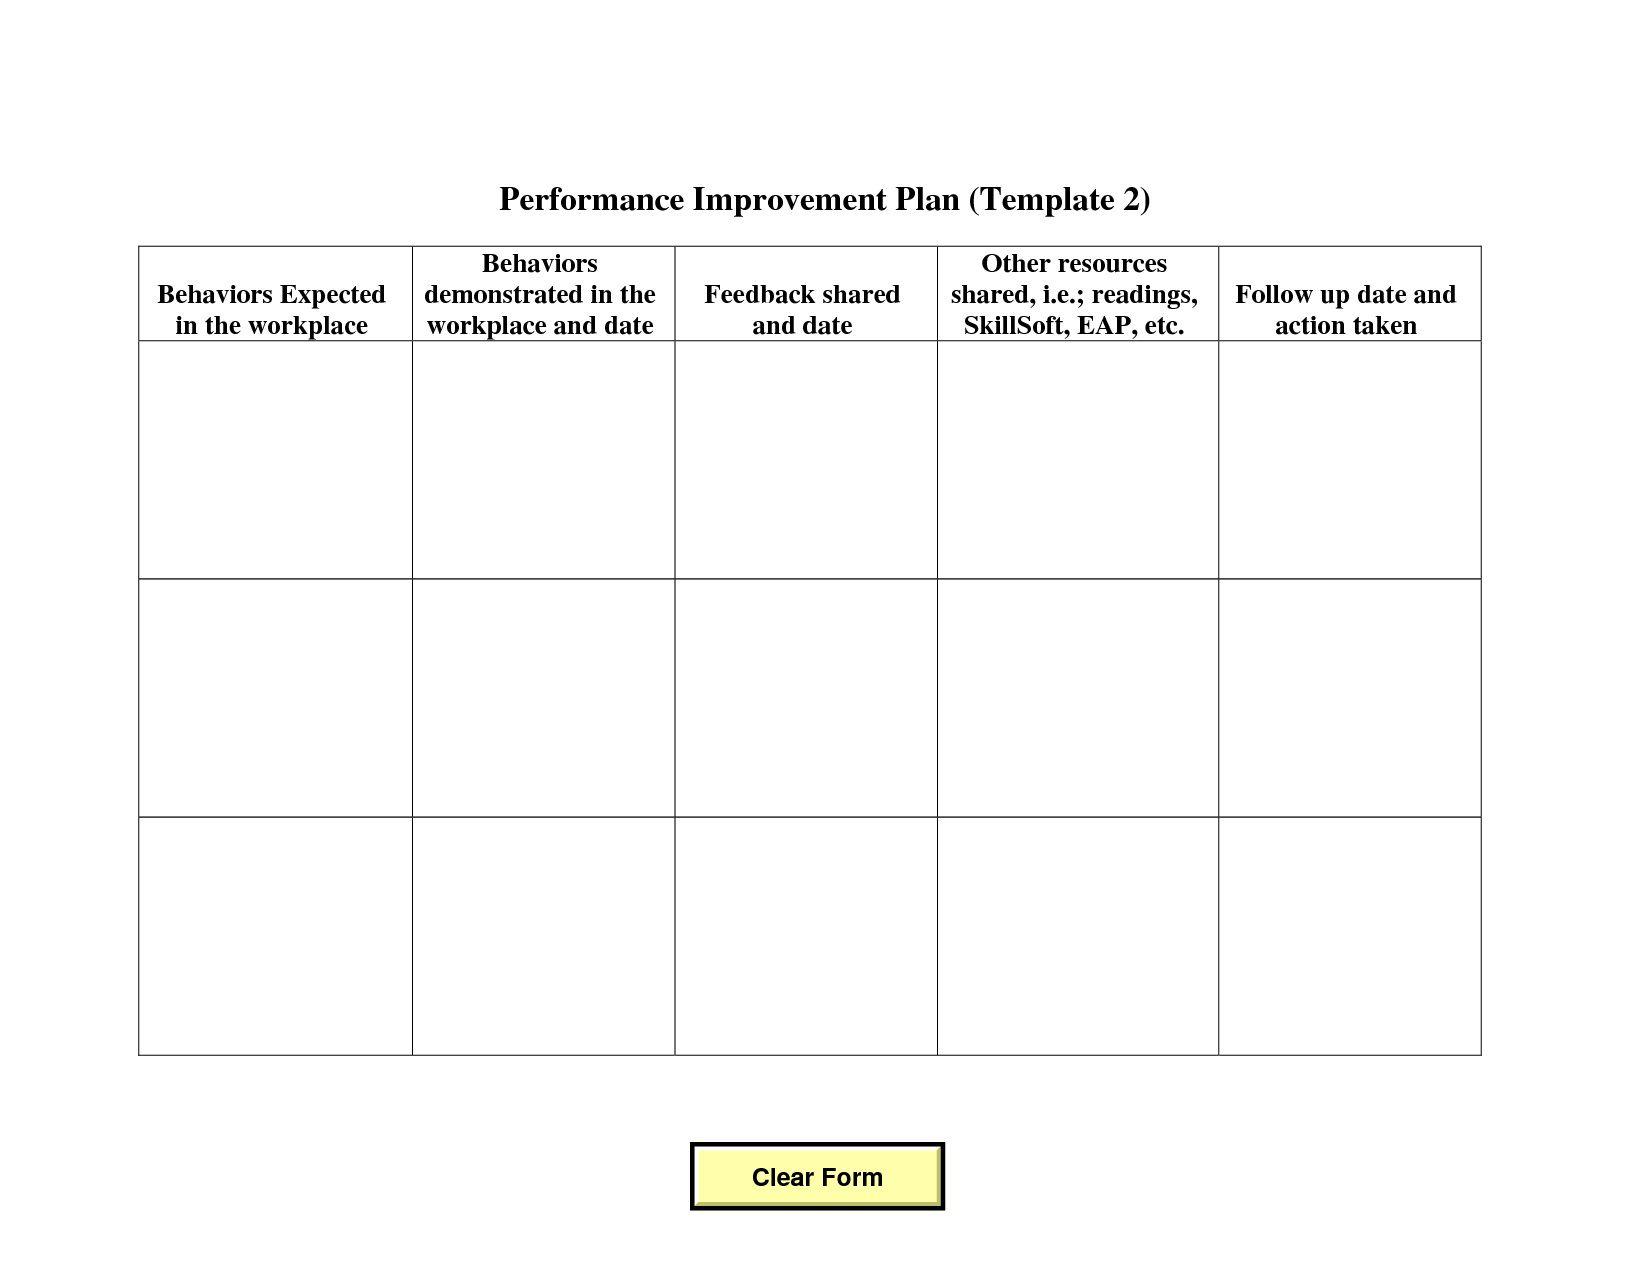 006 Singular School Improvement Planning Template Photo  Templates Plan Sample Deped 2016 Example South AfricaFull